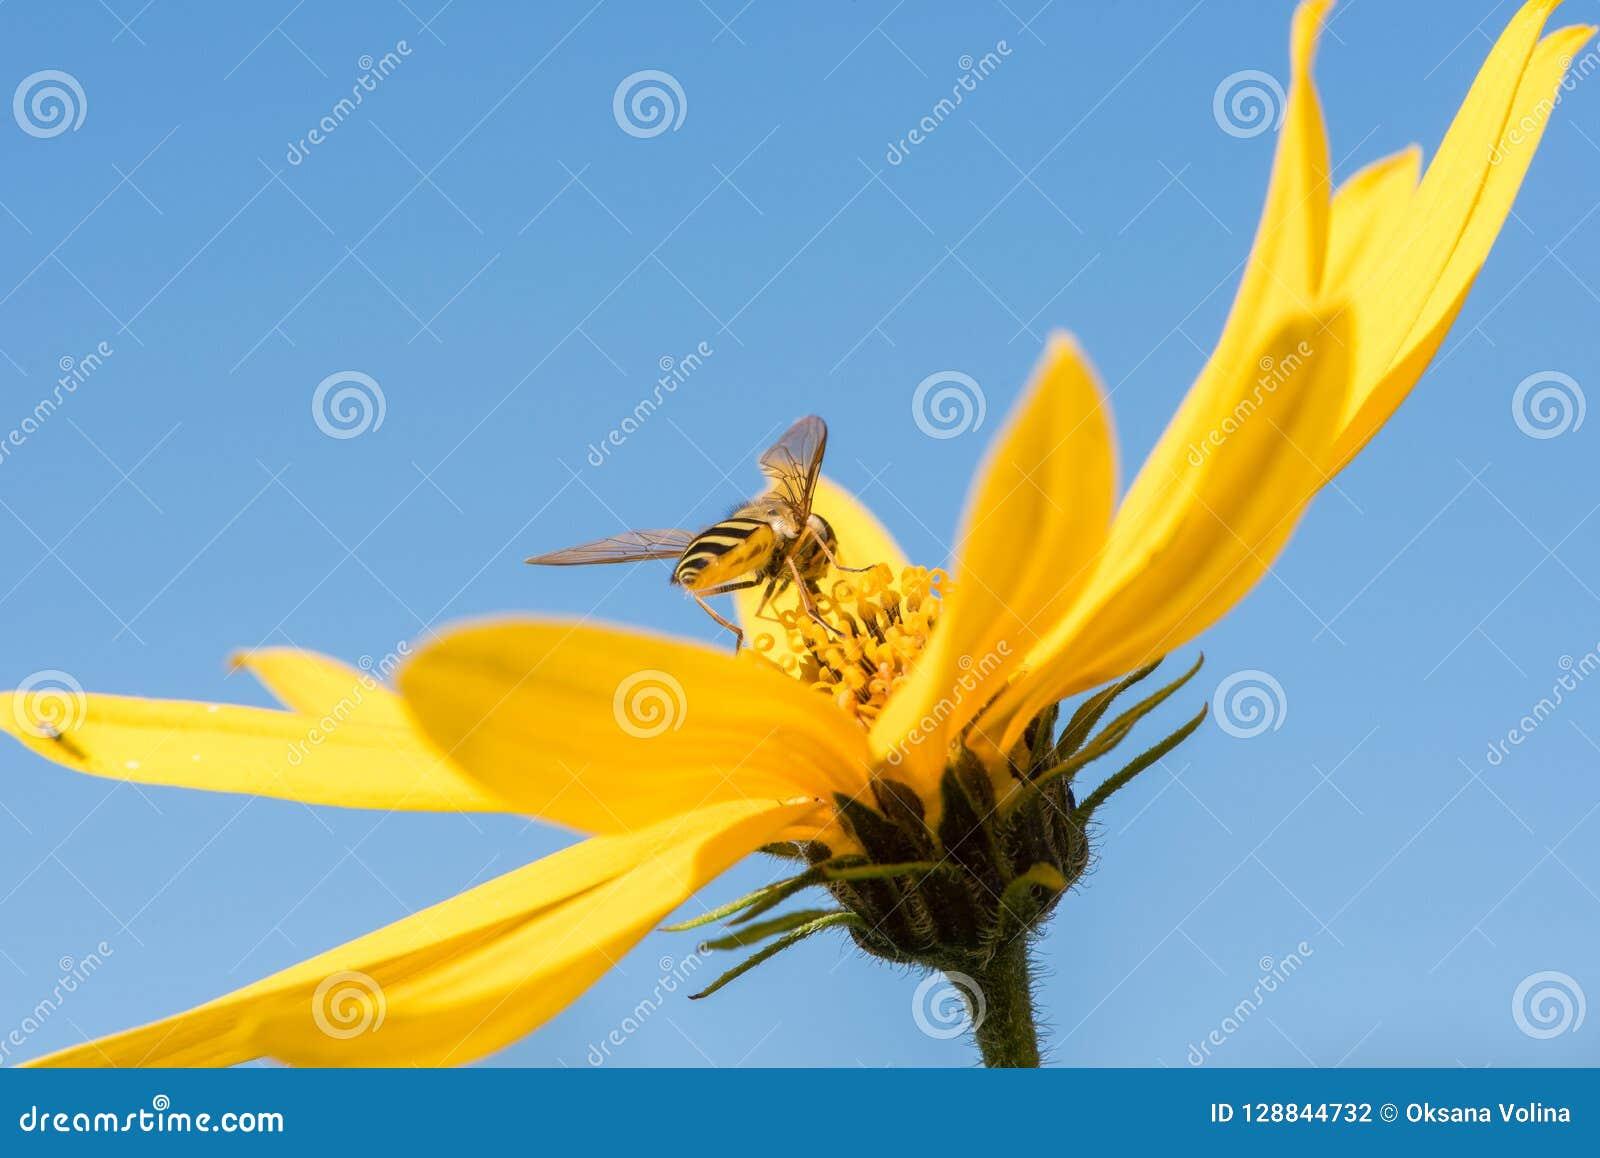 Little wasp collects nectar from flower Jerusalem artichoke in t